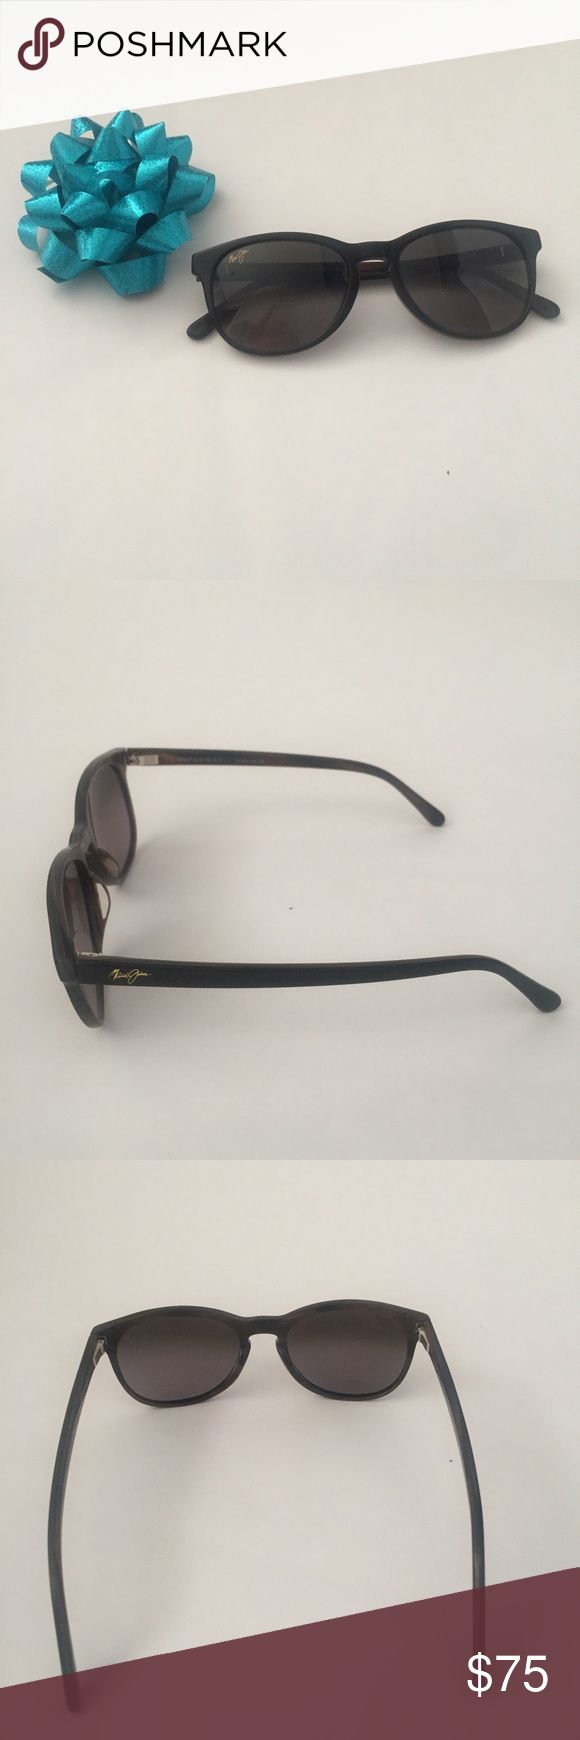 Authentic Maui Jim Pau Hana Polarized Sunglasses Like-new condition Maui Jim Polarized Sunglasses. Great Condition! (Case not available) Maui Jim Accessories Sunglasses